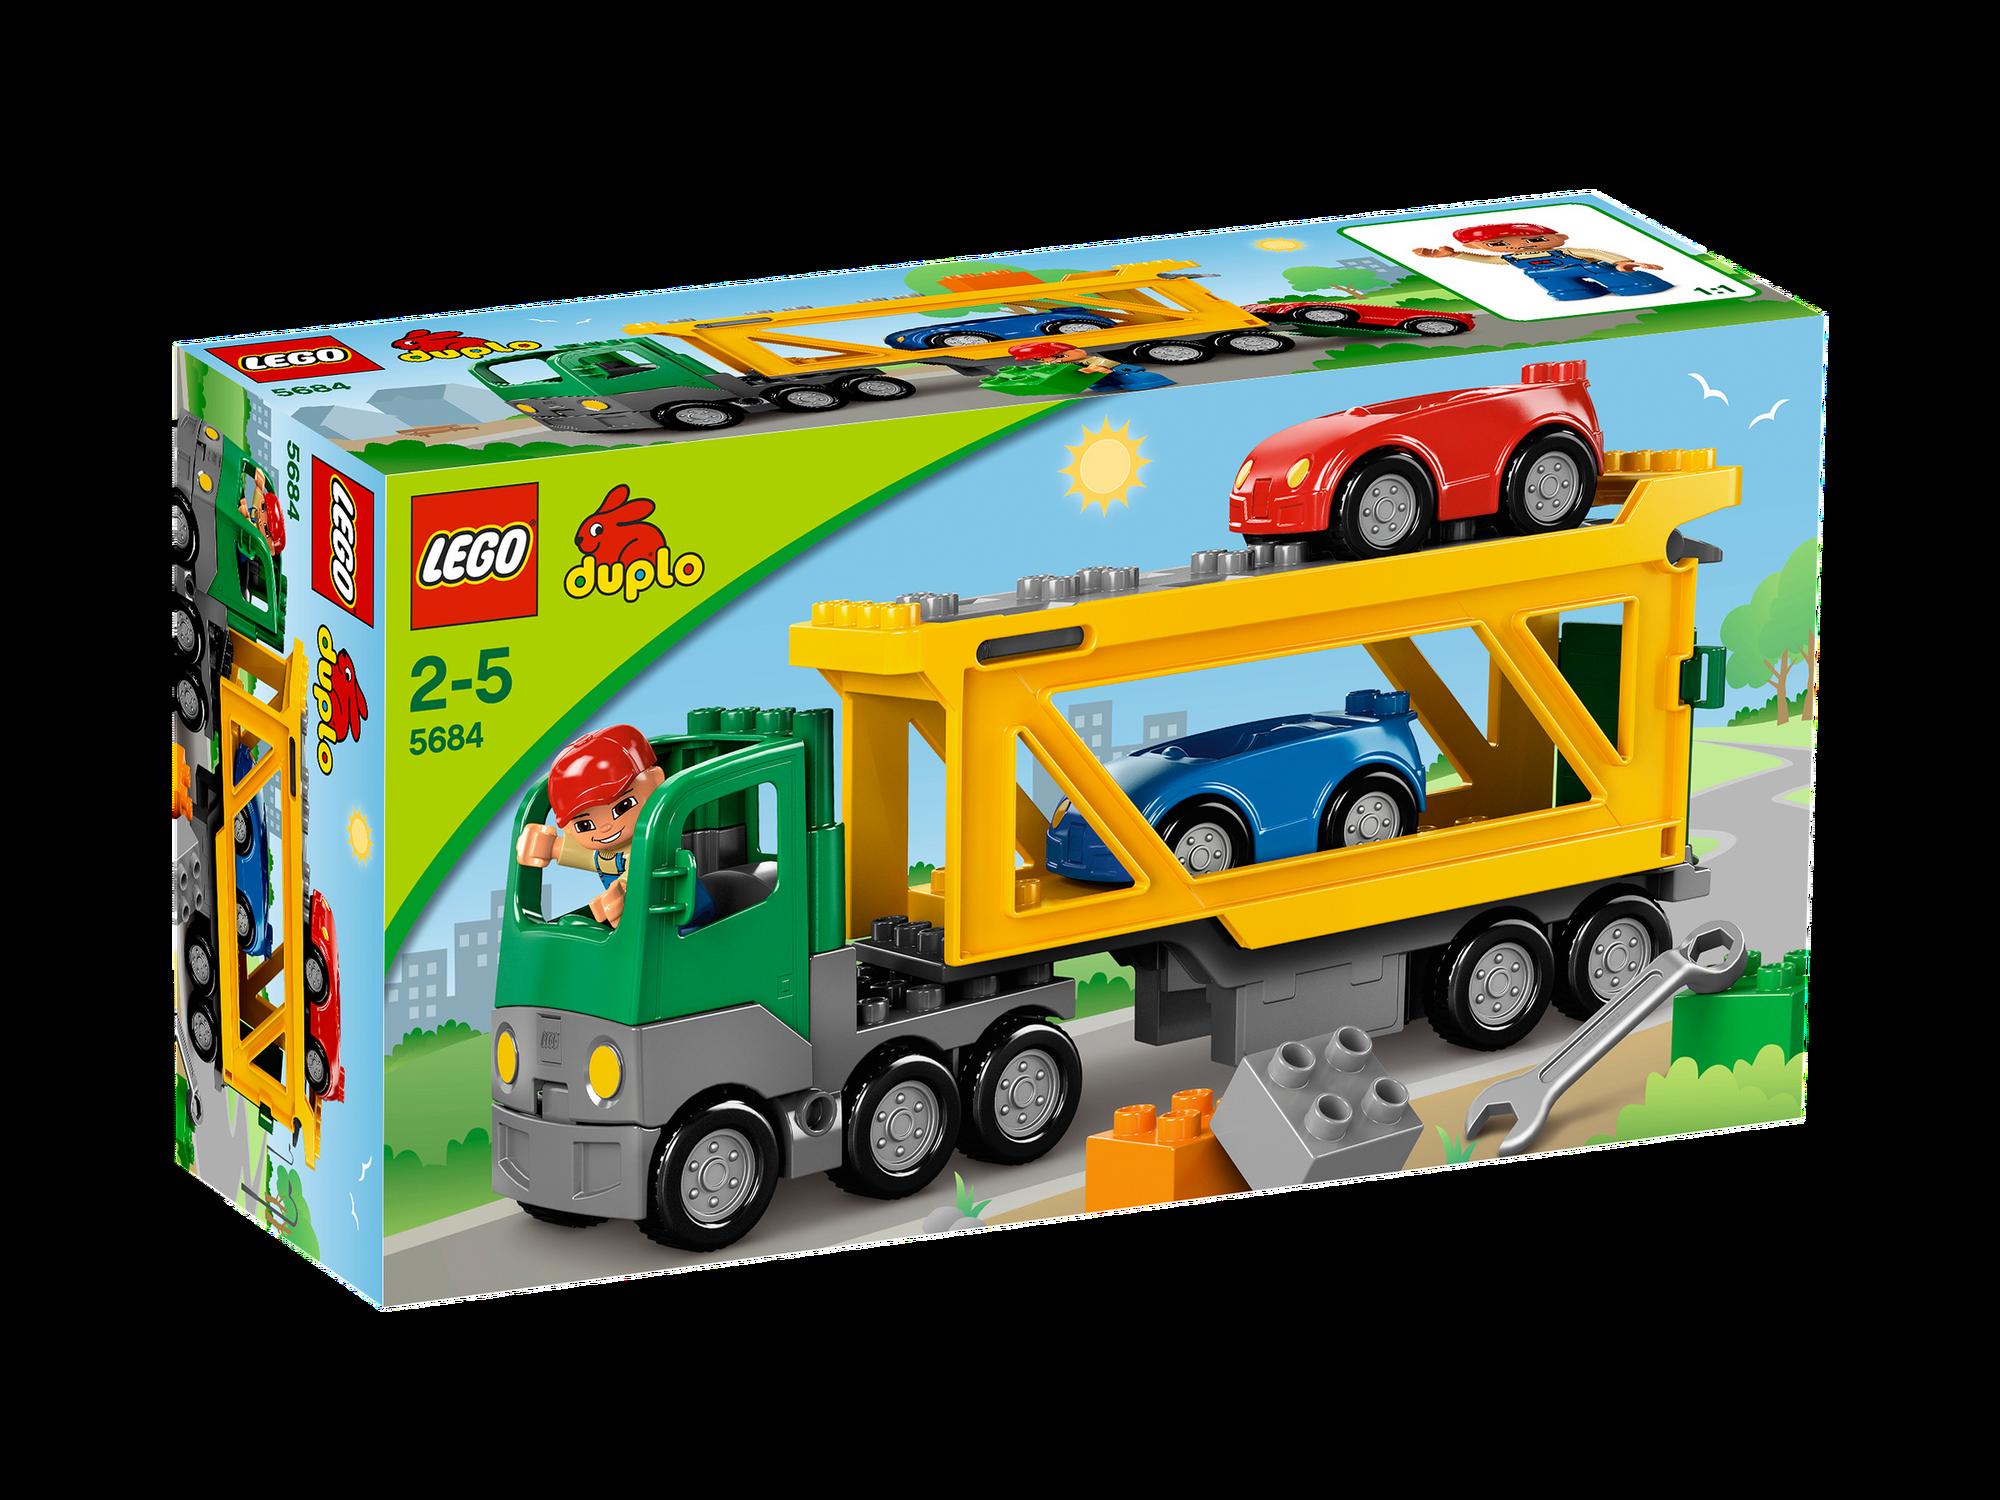 5684 Car Transporter Brickipedia Fandom Powered By Wikia Lego 5682 Duplo Fire Truck